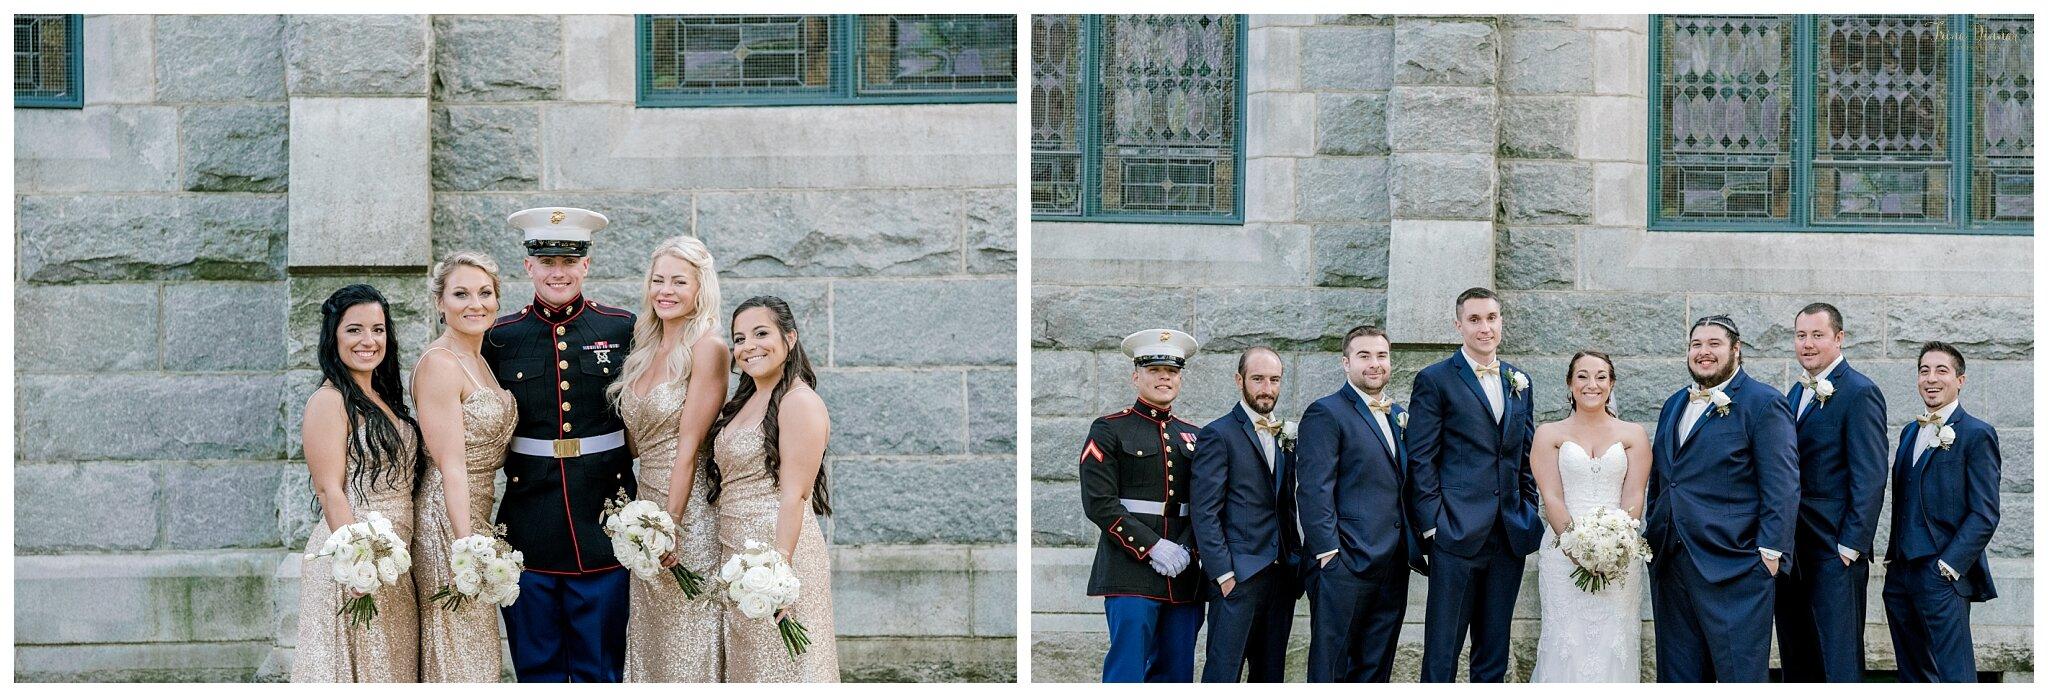 Military Portland Maine Wedding Party